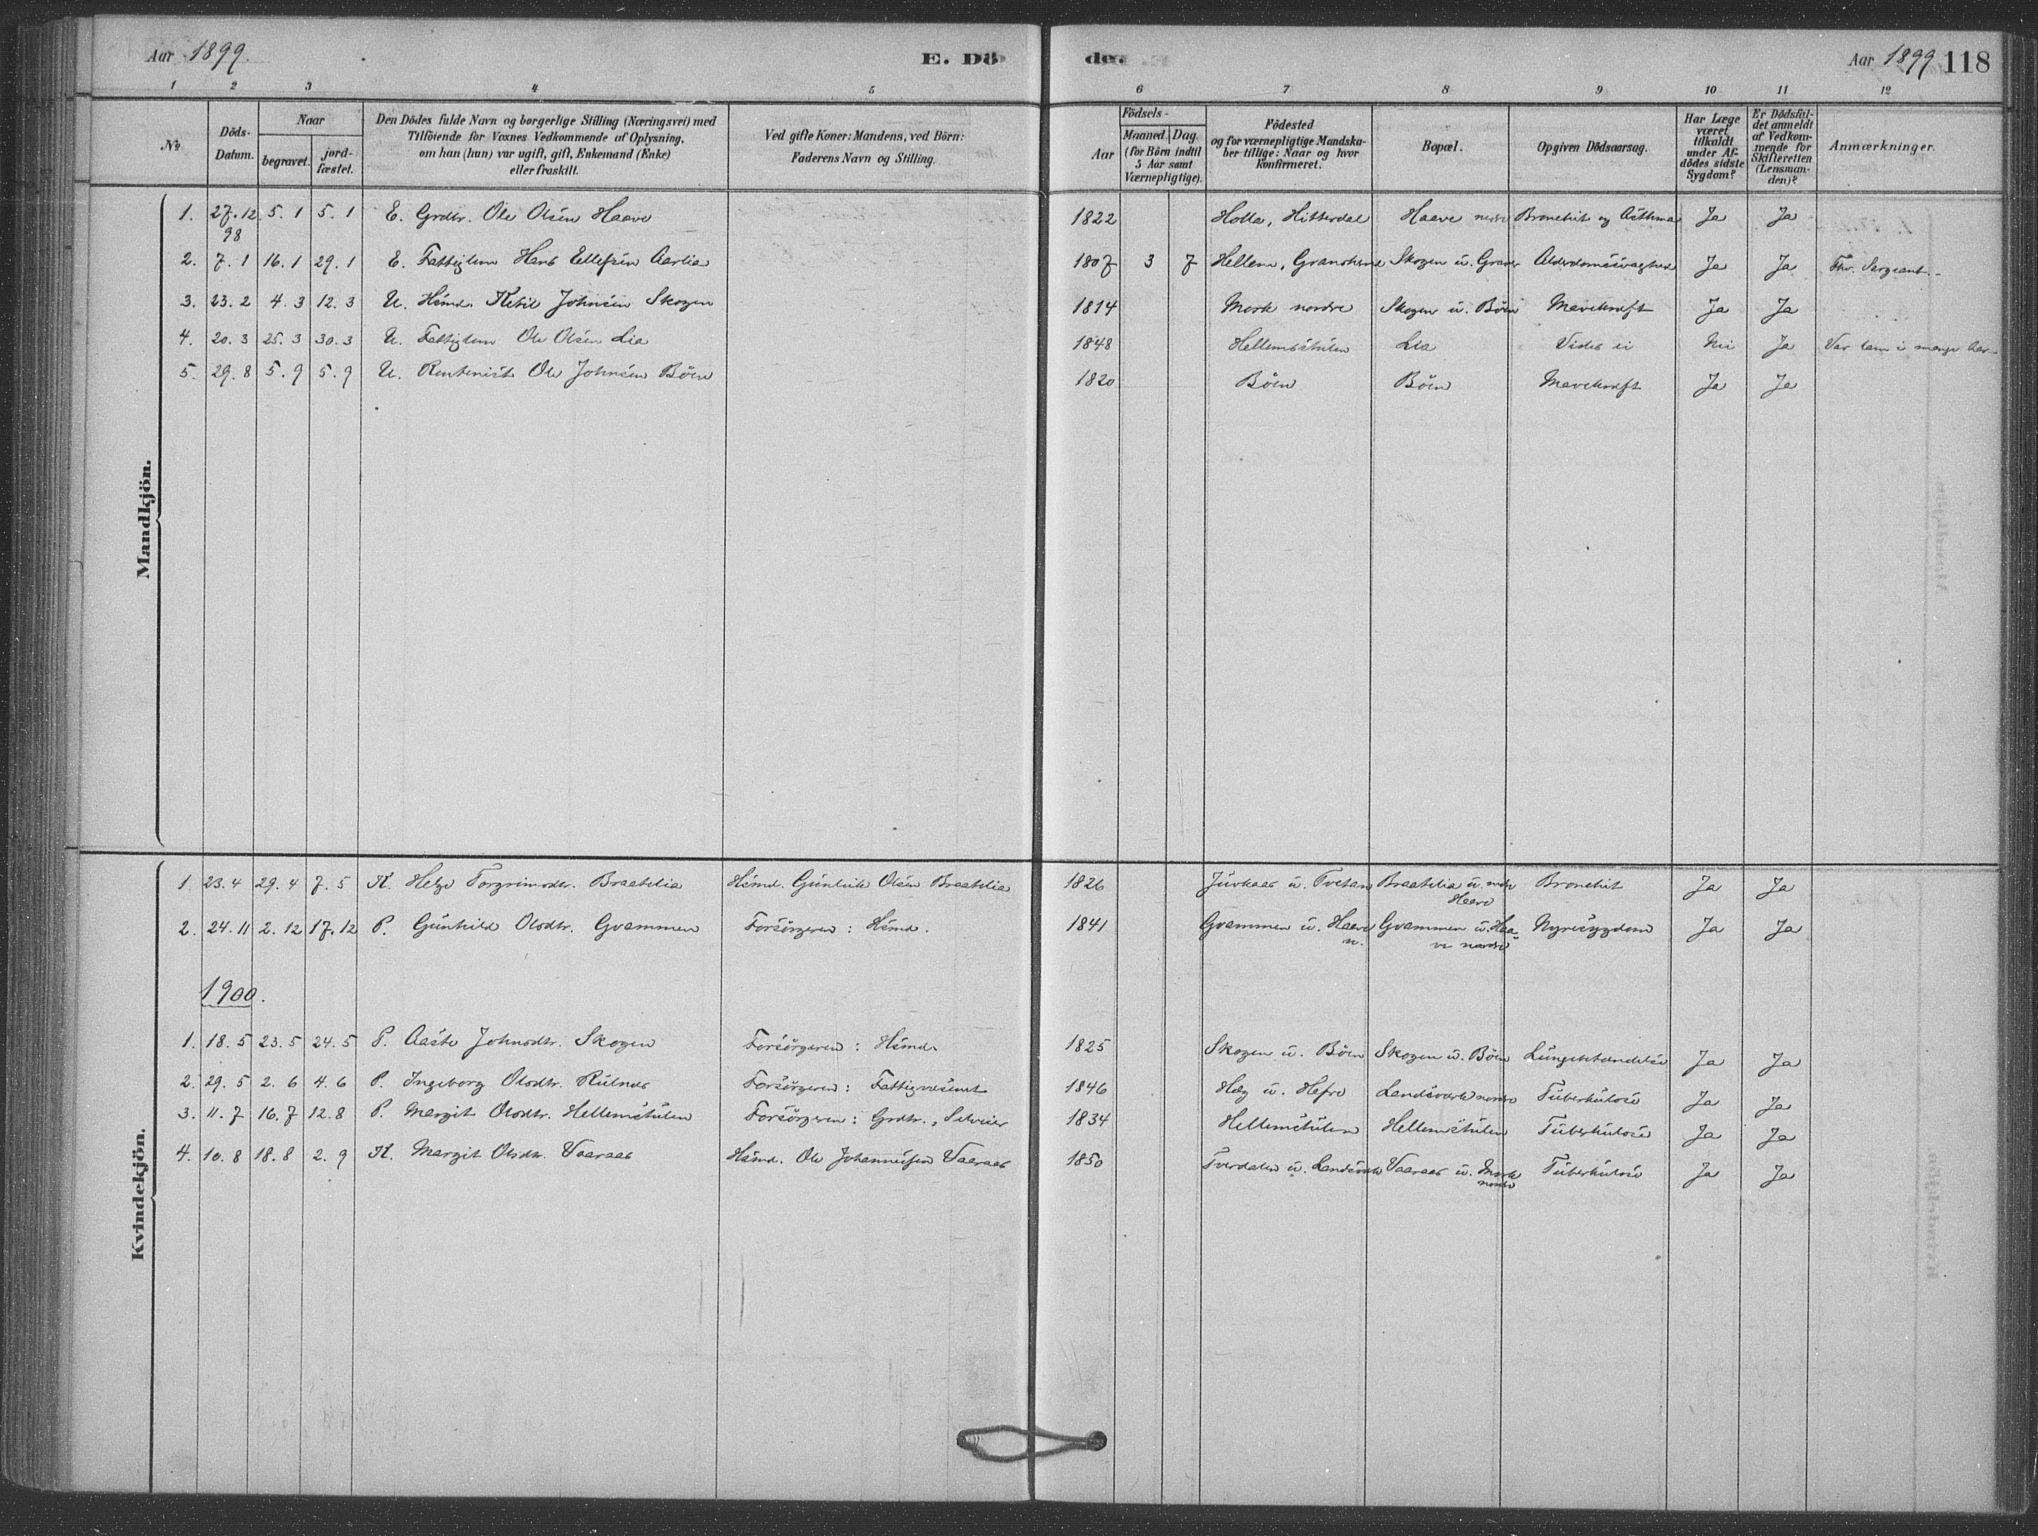 SAKO, Heddal kirkebøker, F/Fb/L0002: Ministerialbok nr. II 2, 1878-1913, s. 118